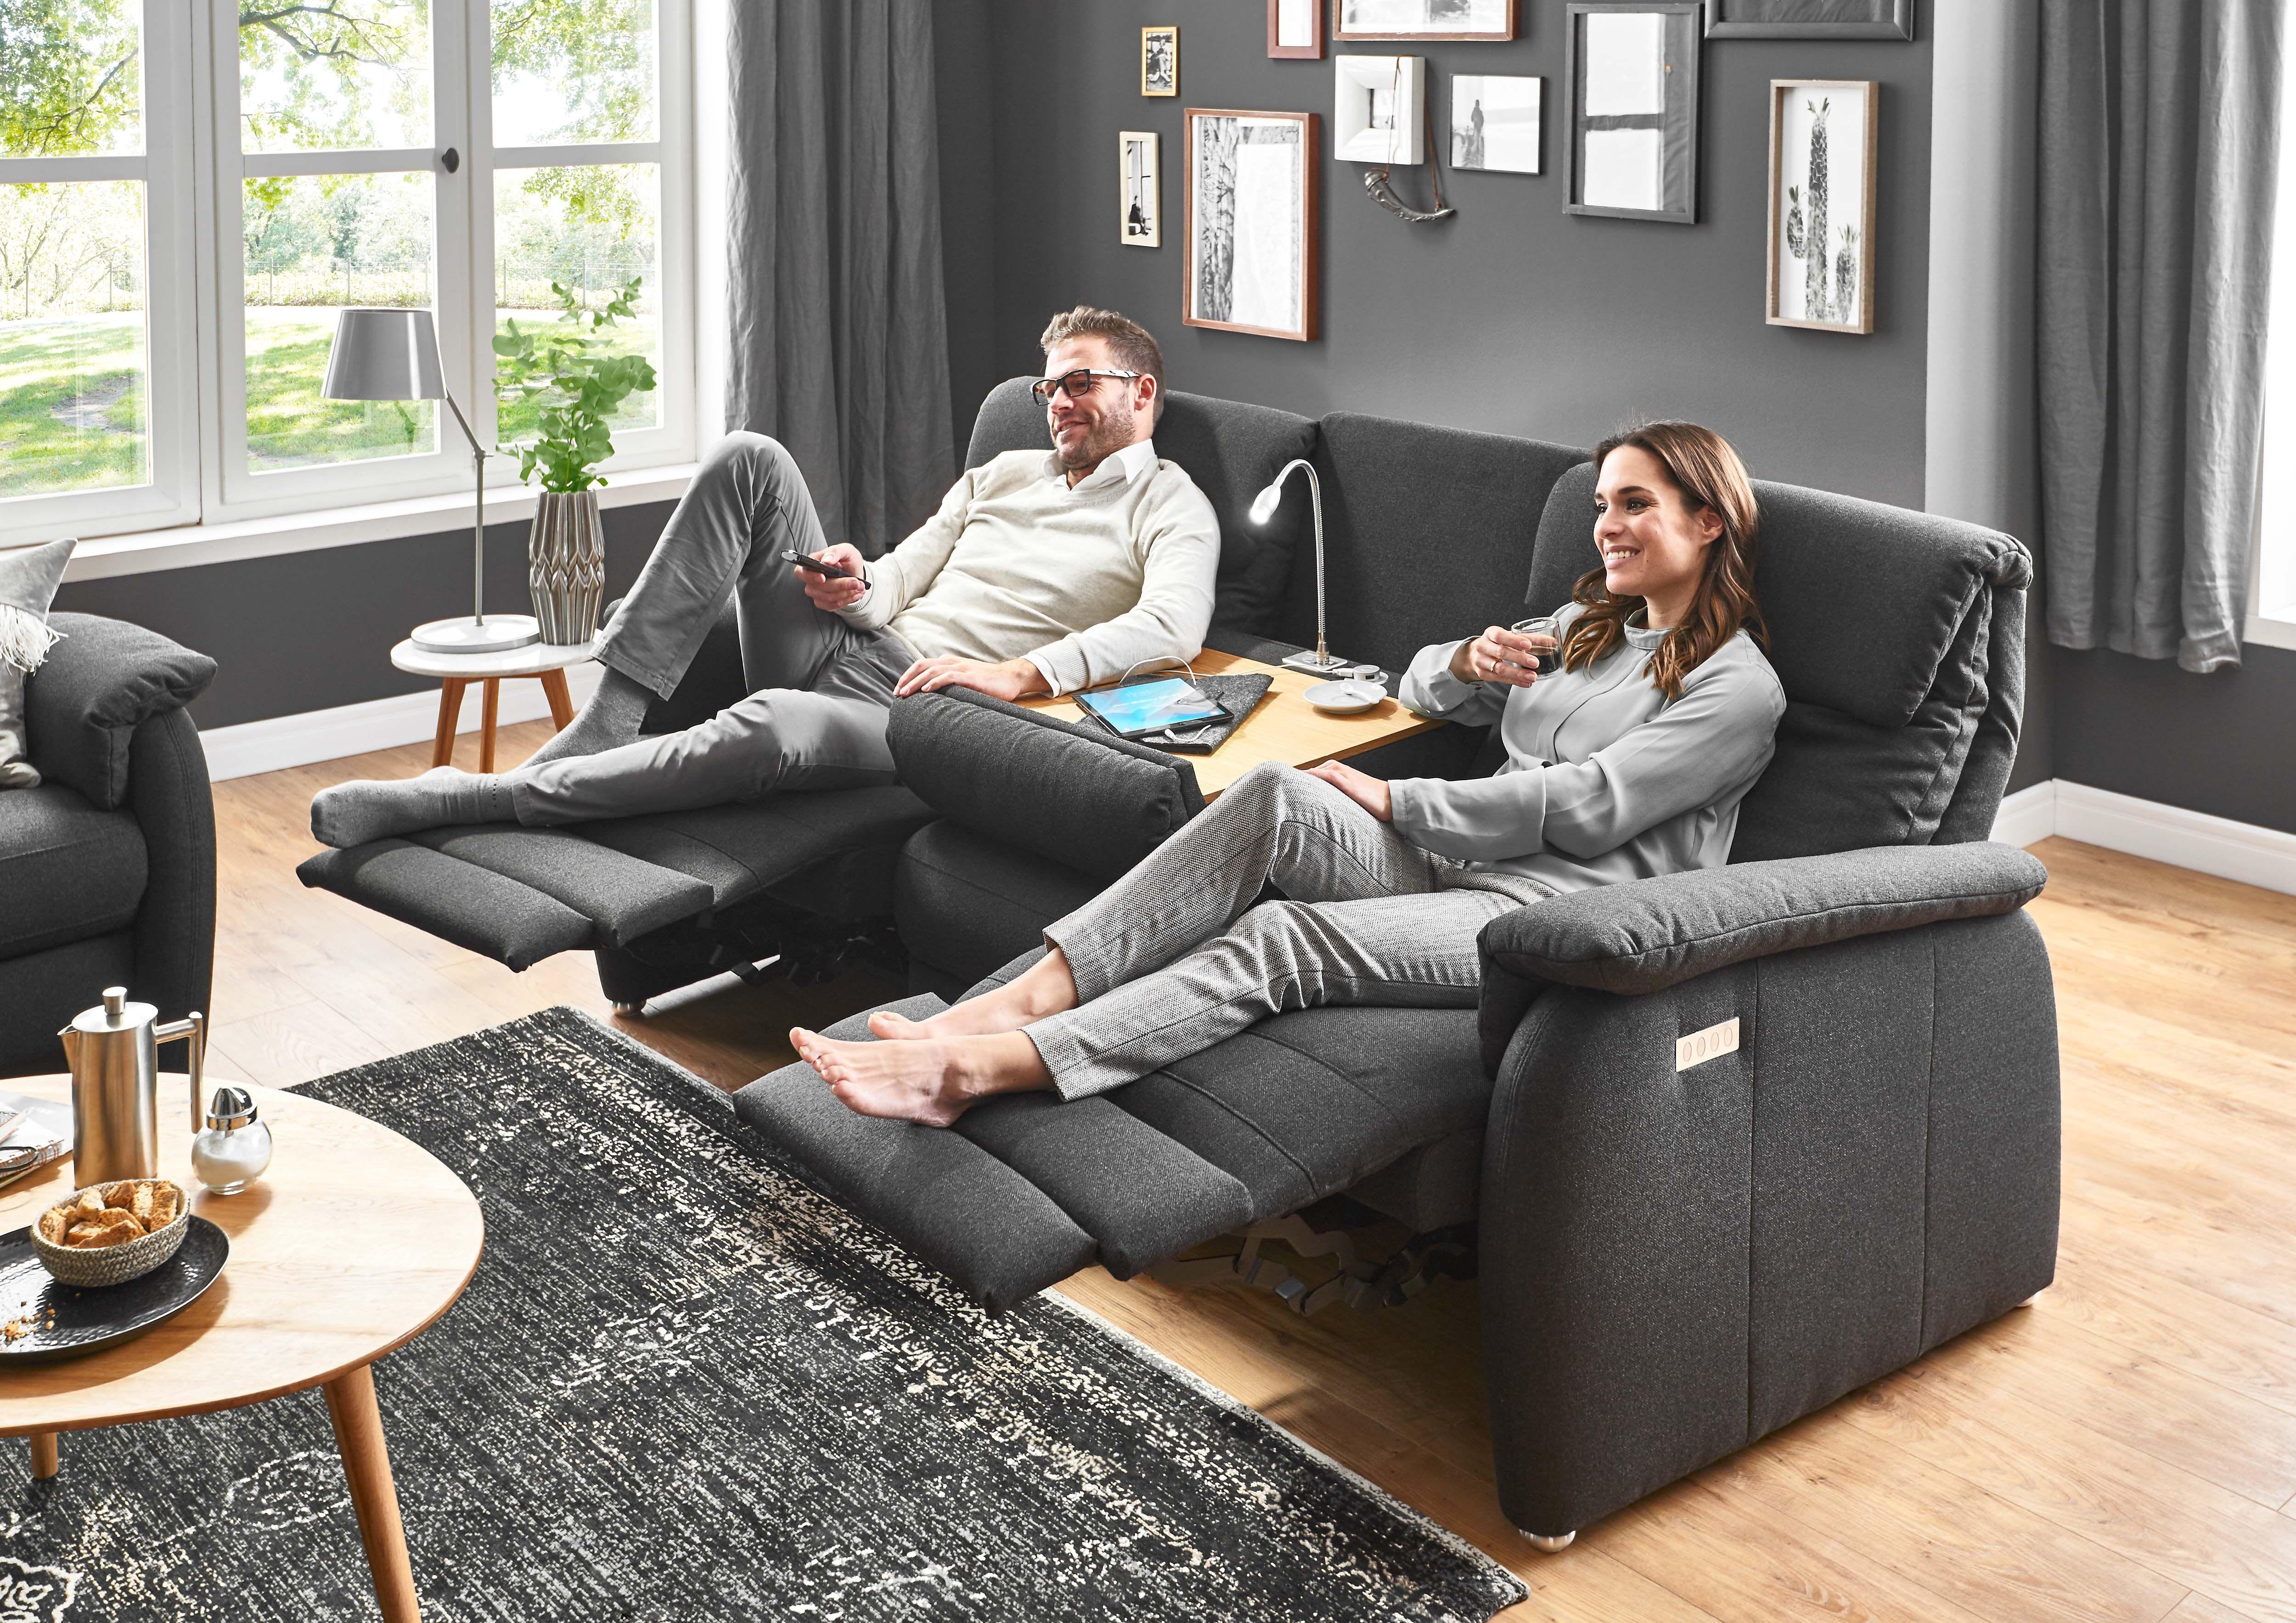 Sofa Mit Integrierter Relaxfunktion Wohnzimmer Sofa Sofa Sessel